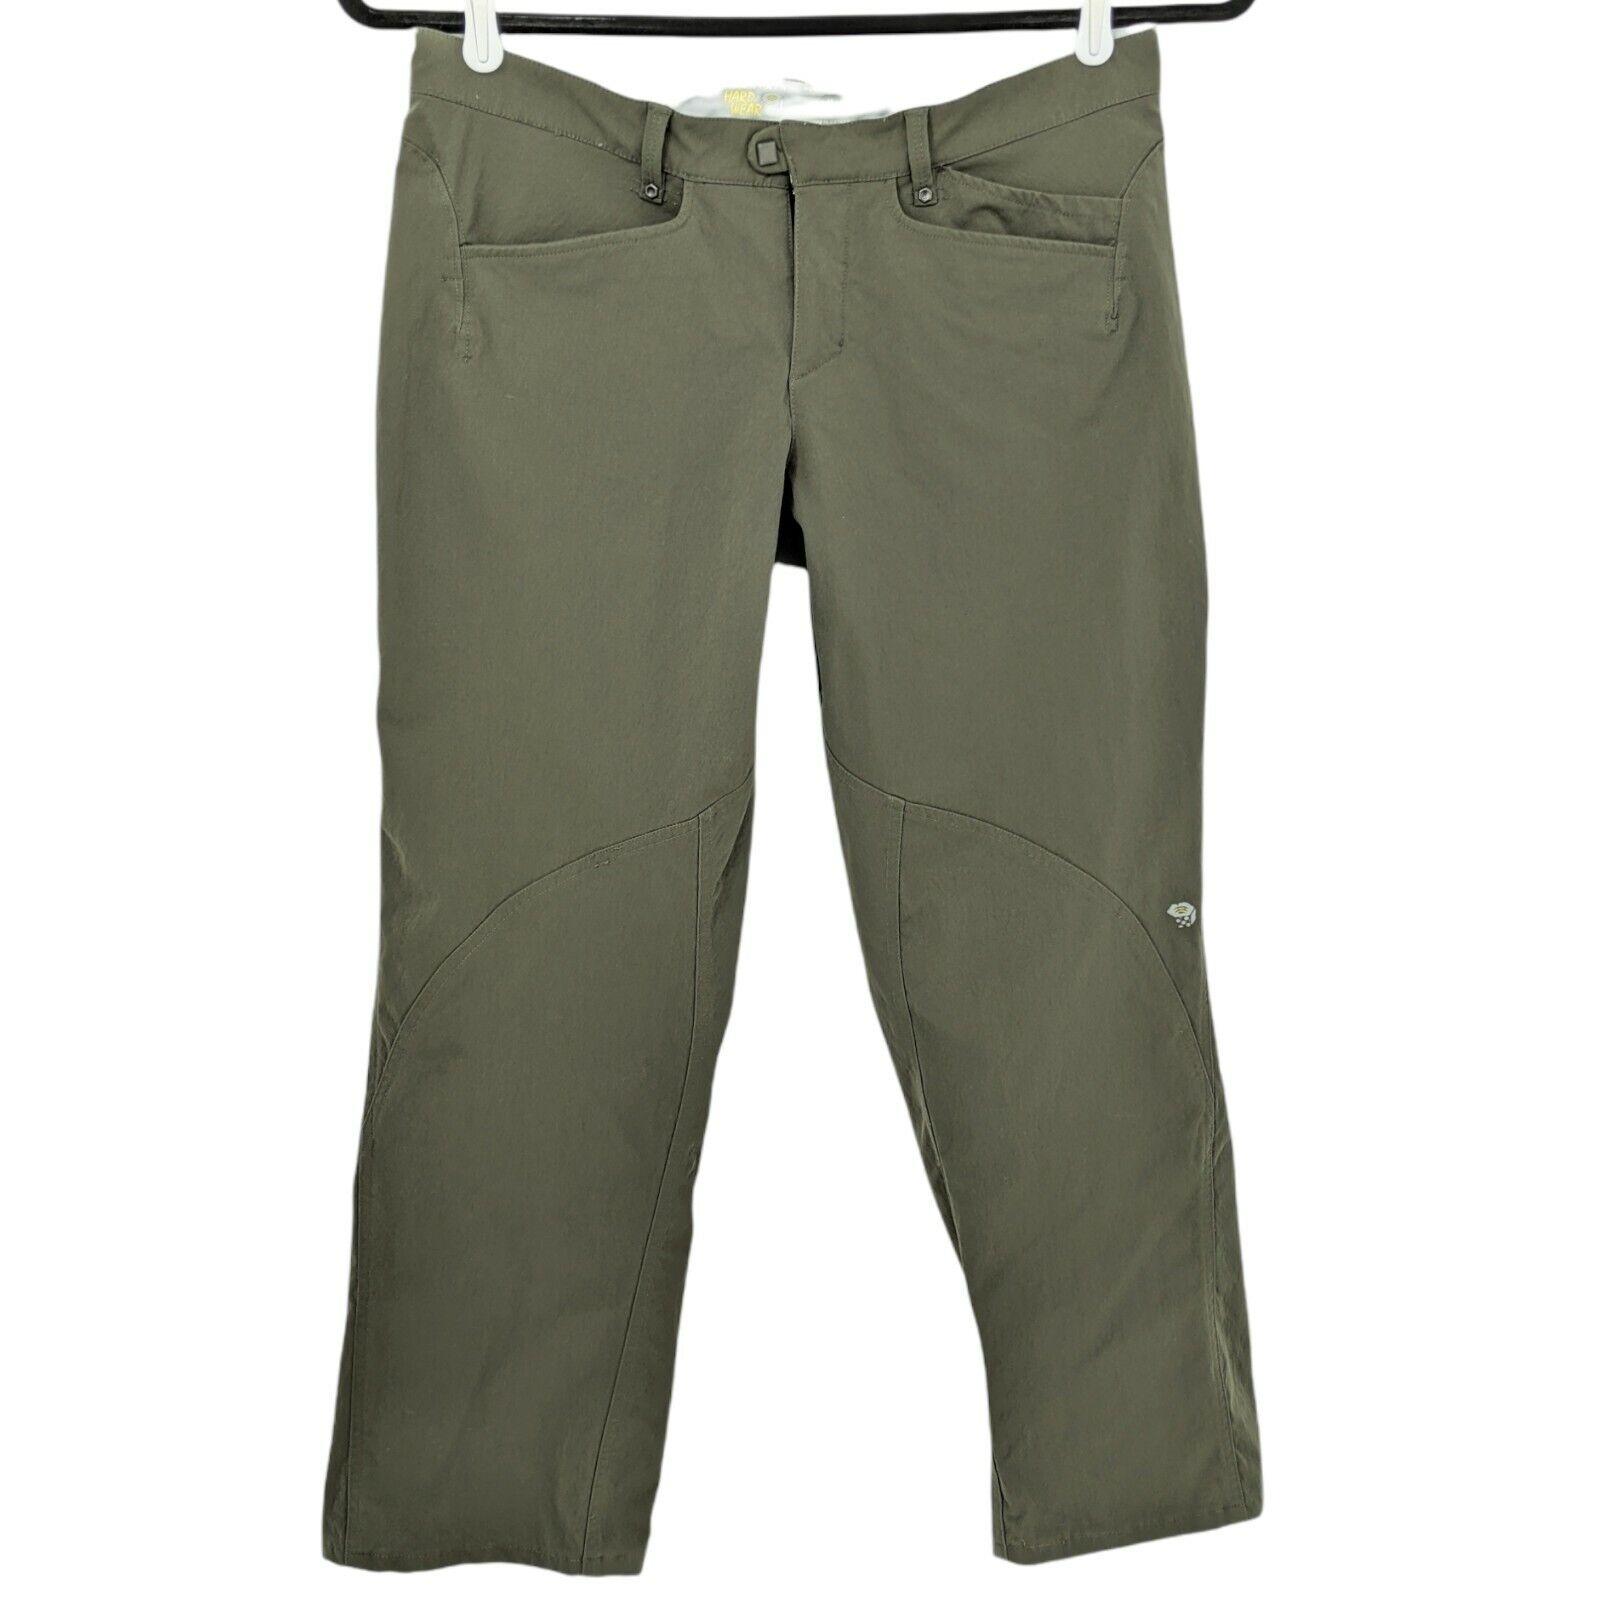 Mountain Hardwear Outdoor Pants Nylon Stretch Hiking Travel Green Women's Sz 10